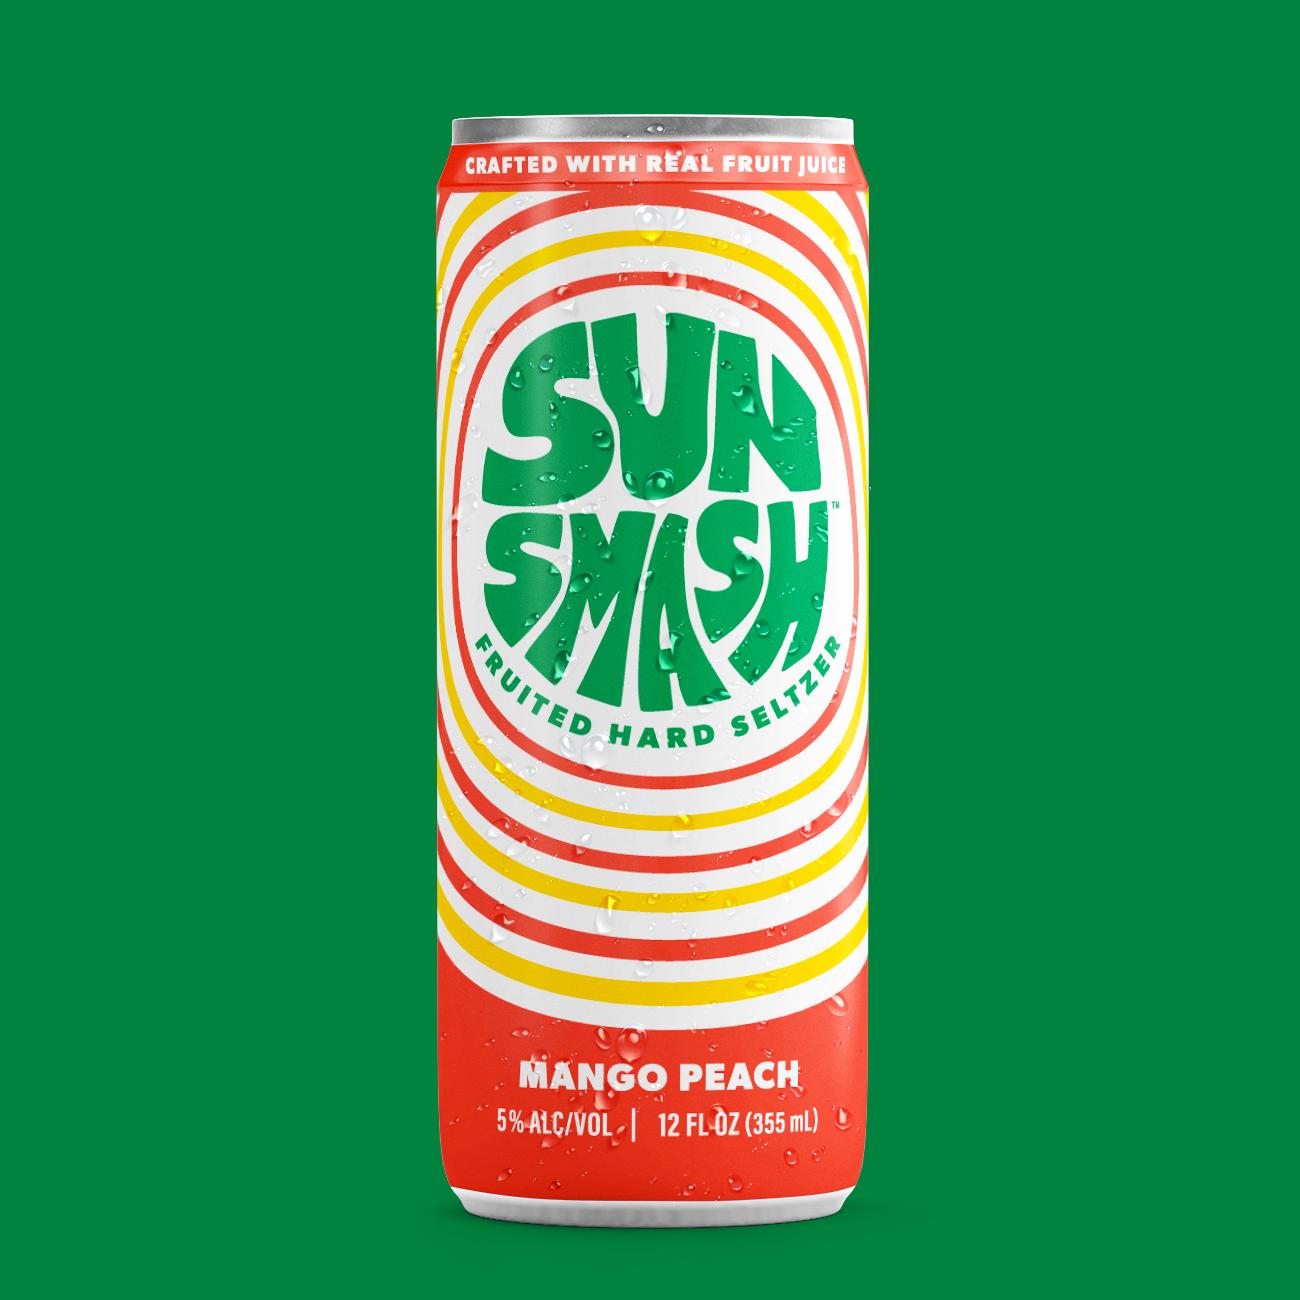 SunSmash Mango Peach Hard Seltzer